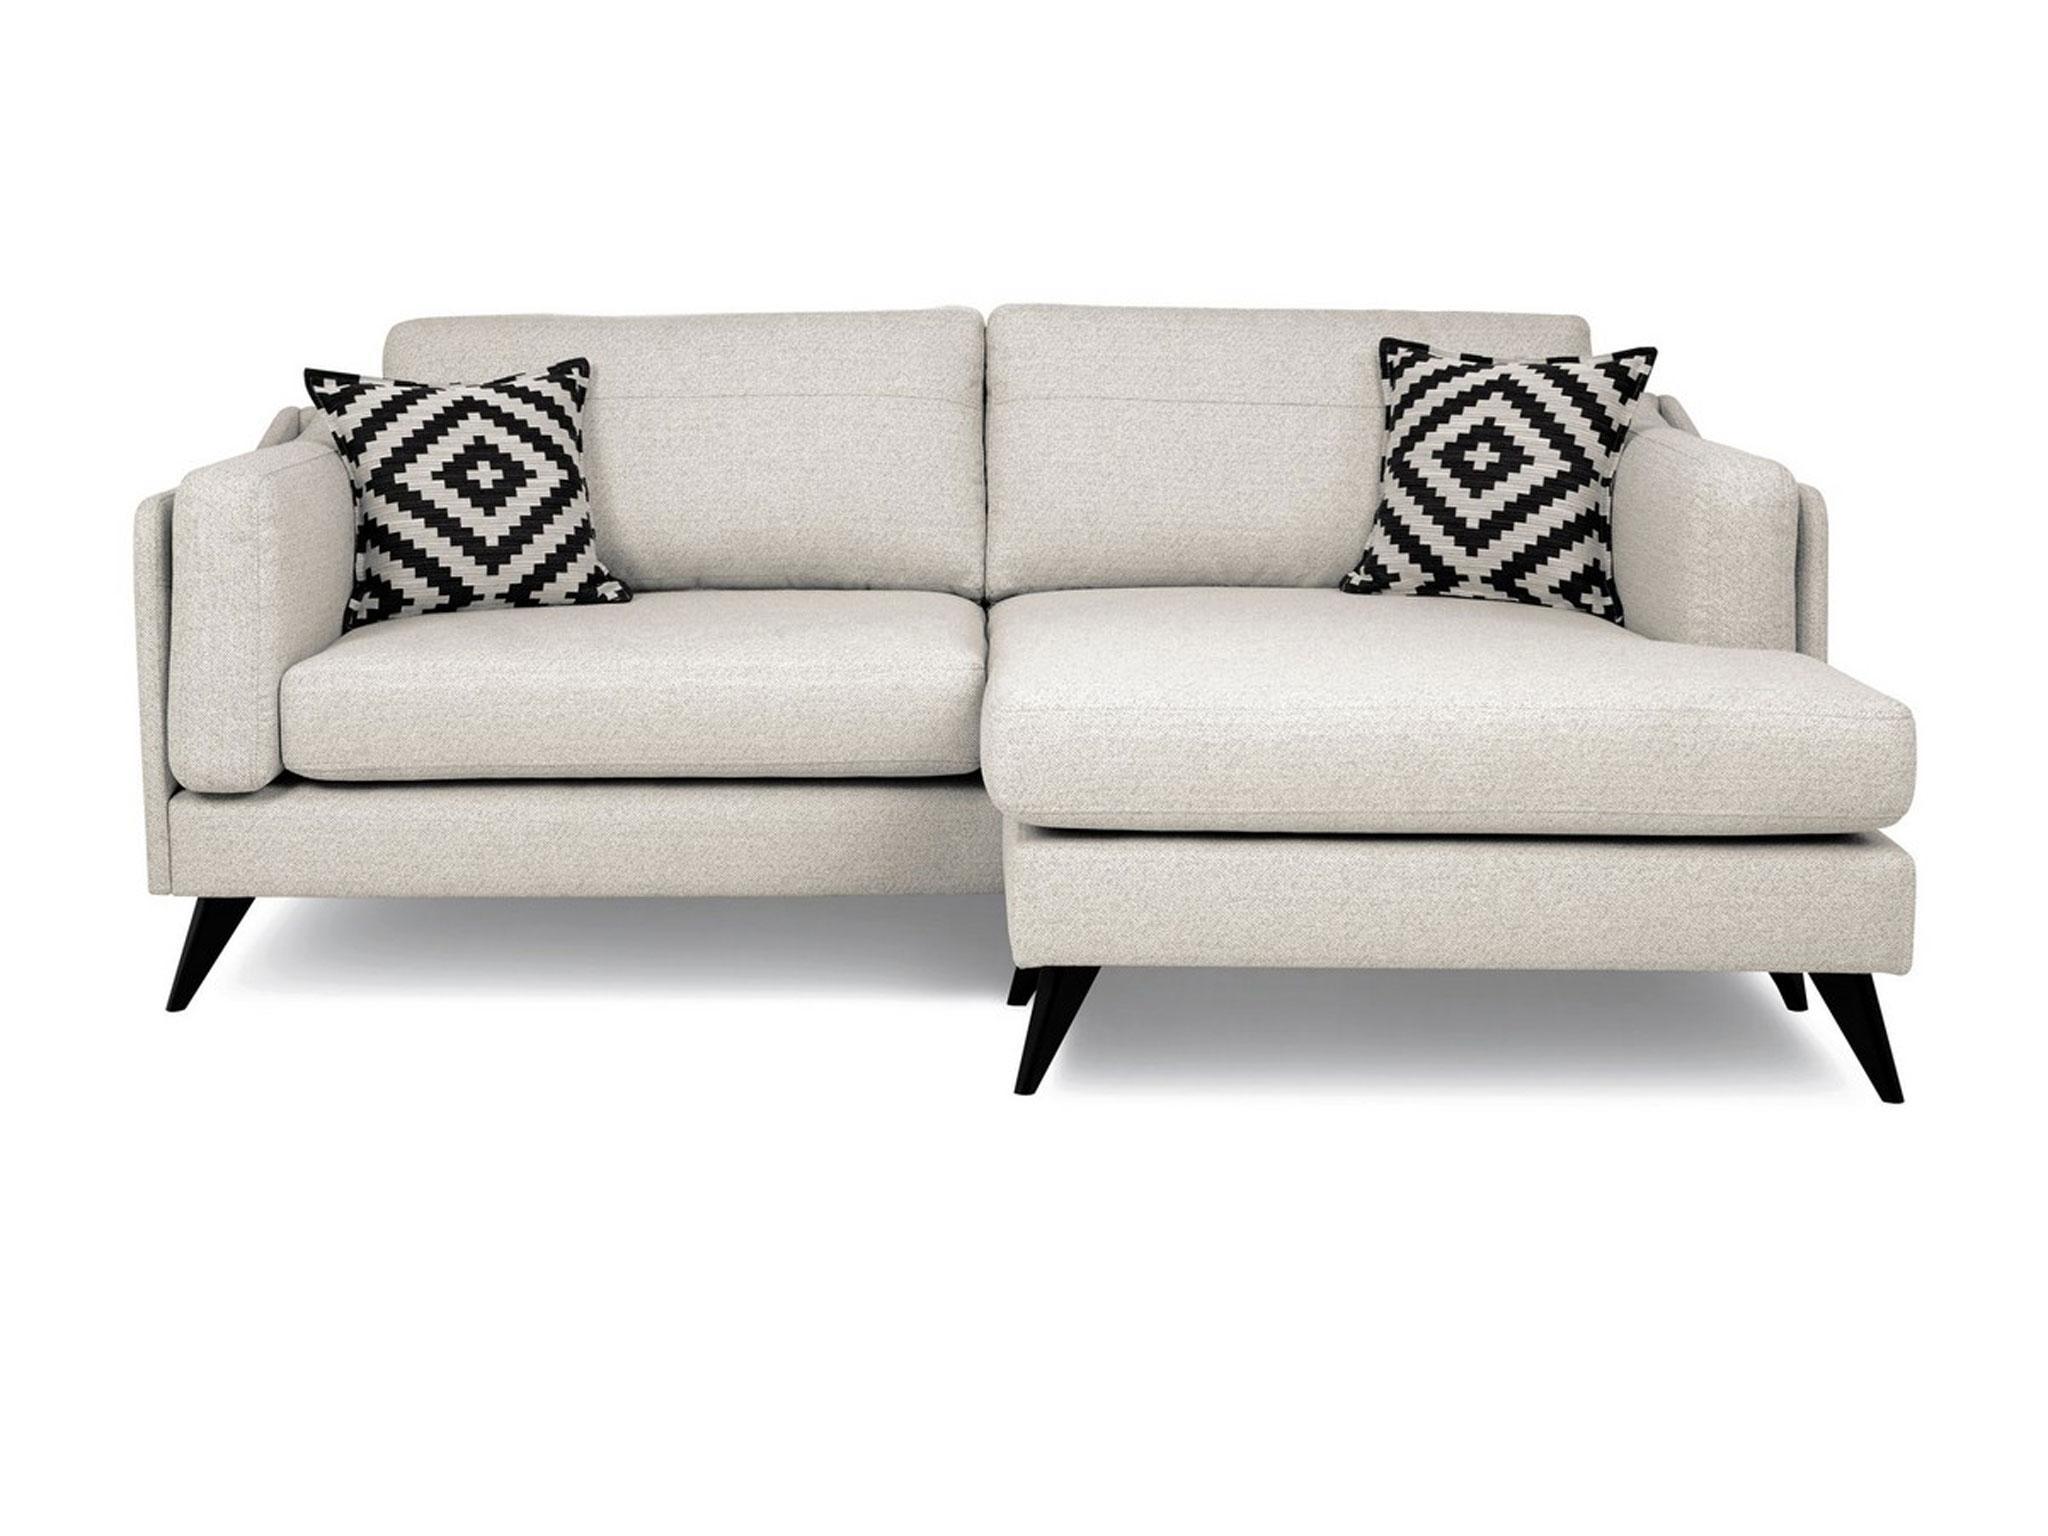 Take Apart Dfs Sofa Review Home Co